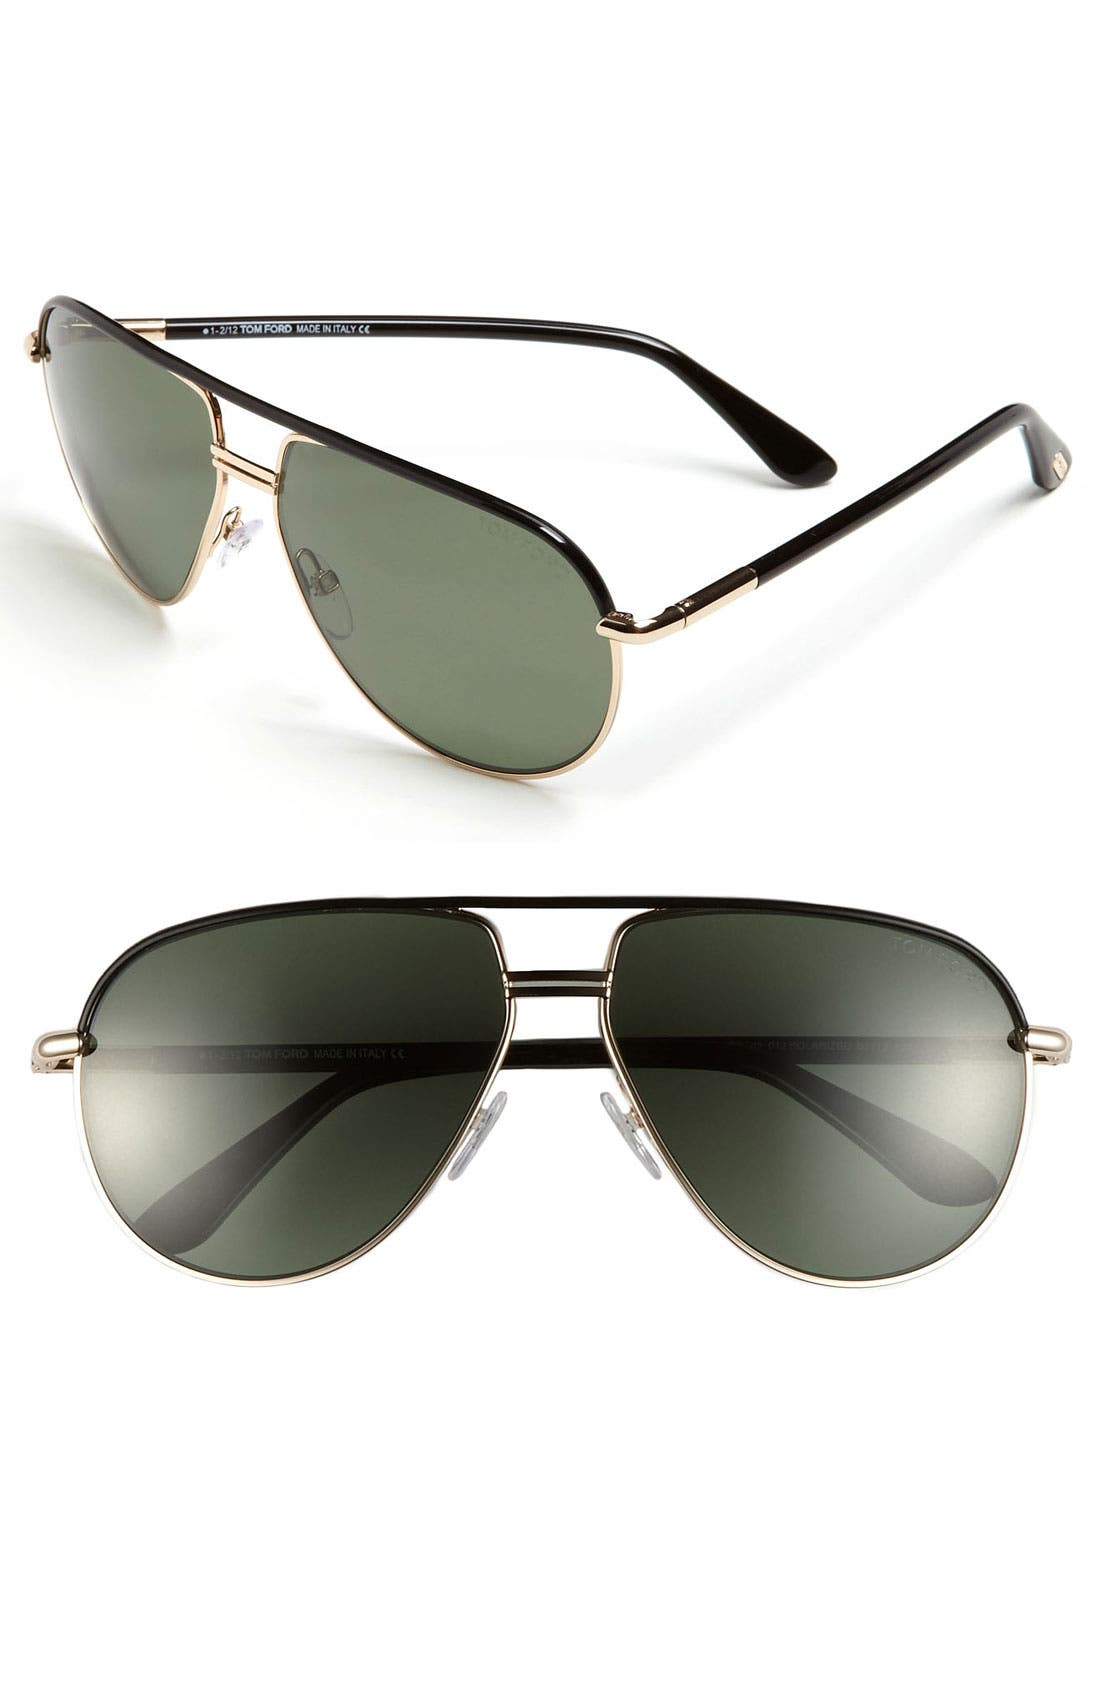 Alternate Image 1 Selected - Tom Ford 'Cole' 61mm Polarized Aviator Sunglasses